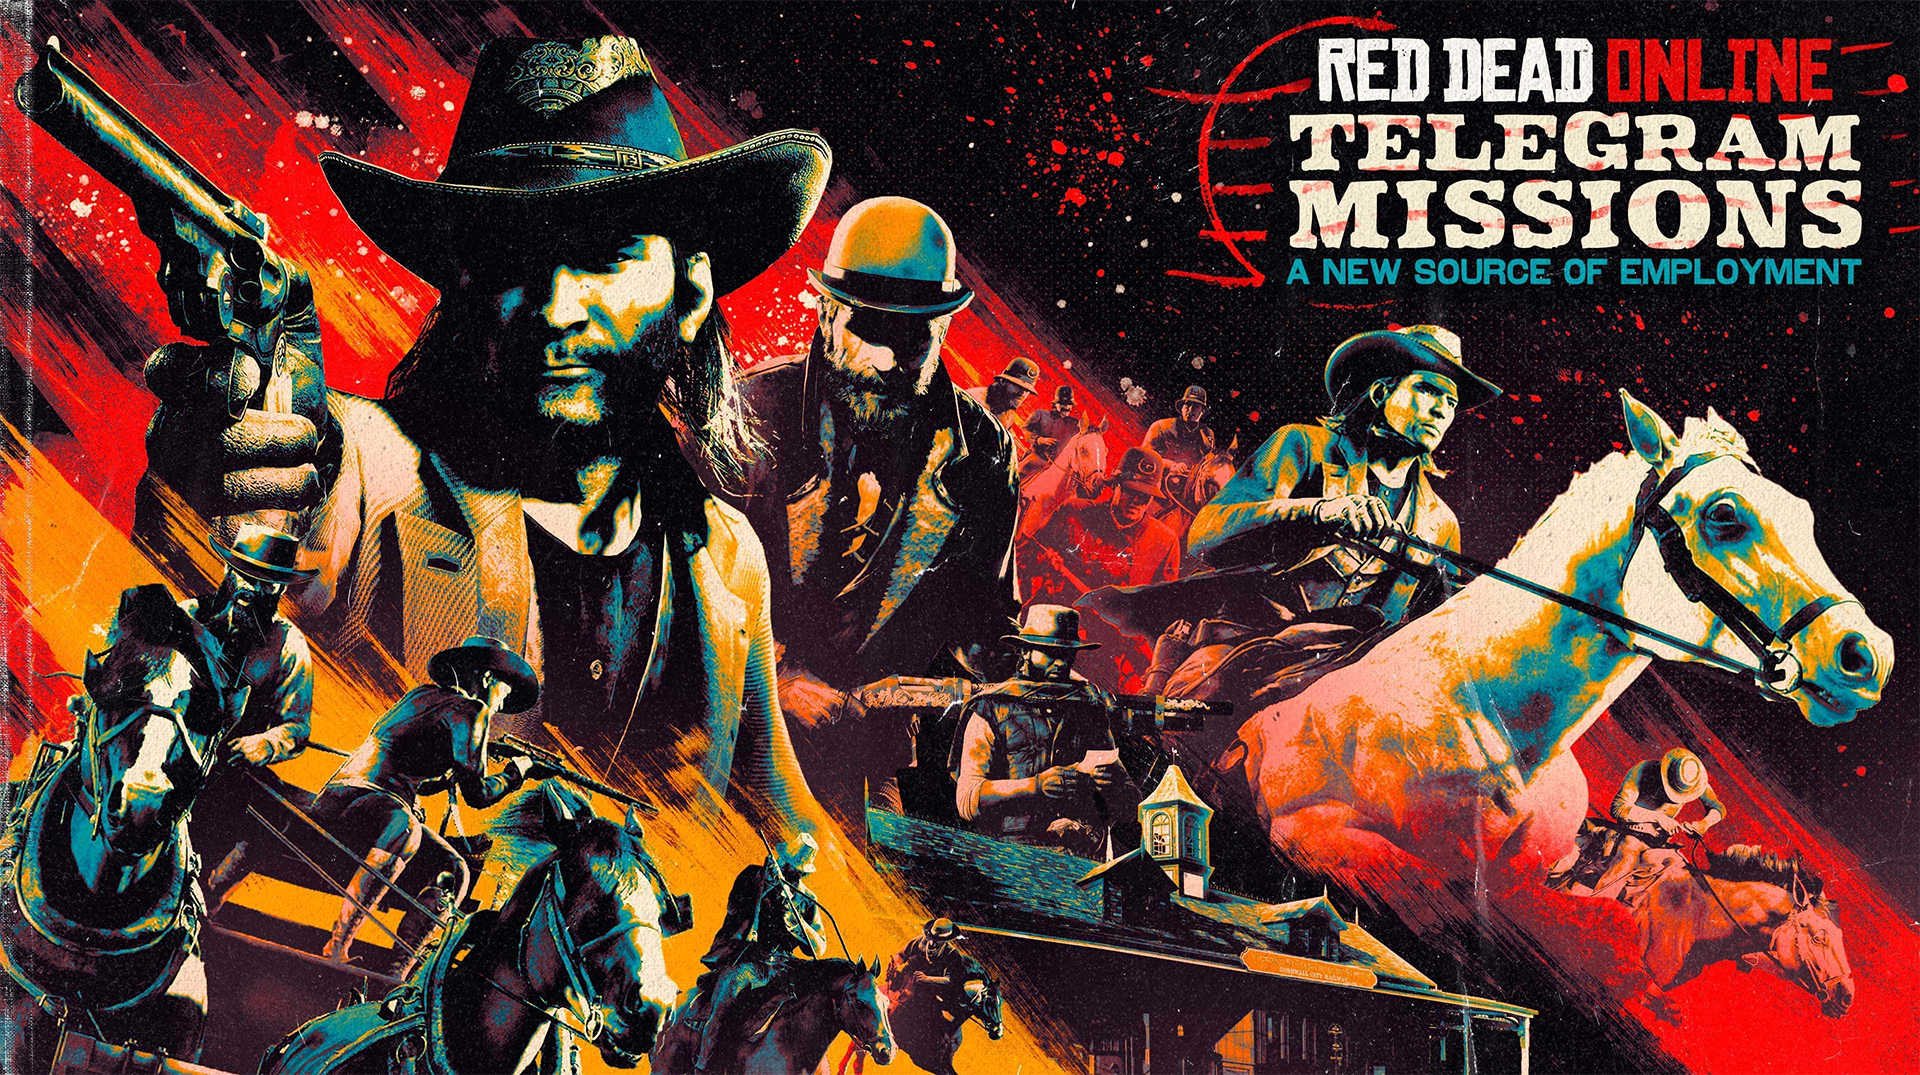 Red Dead Online Missions Télégrammes